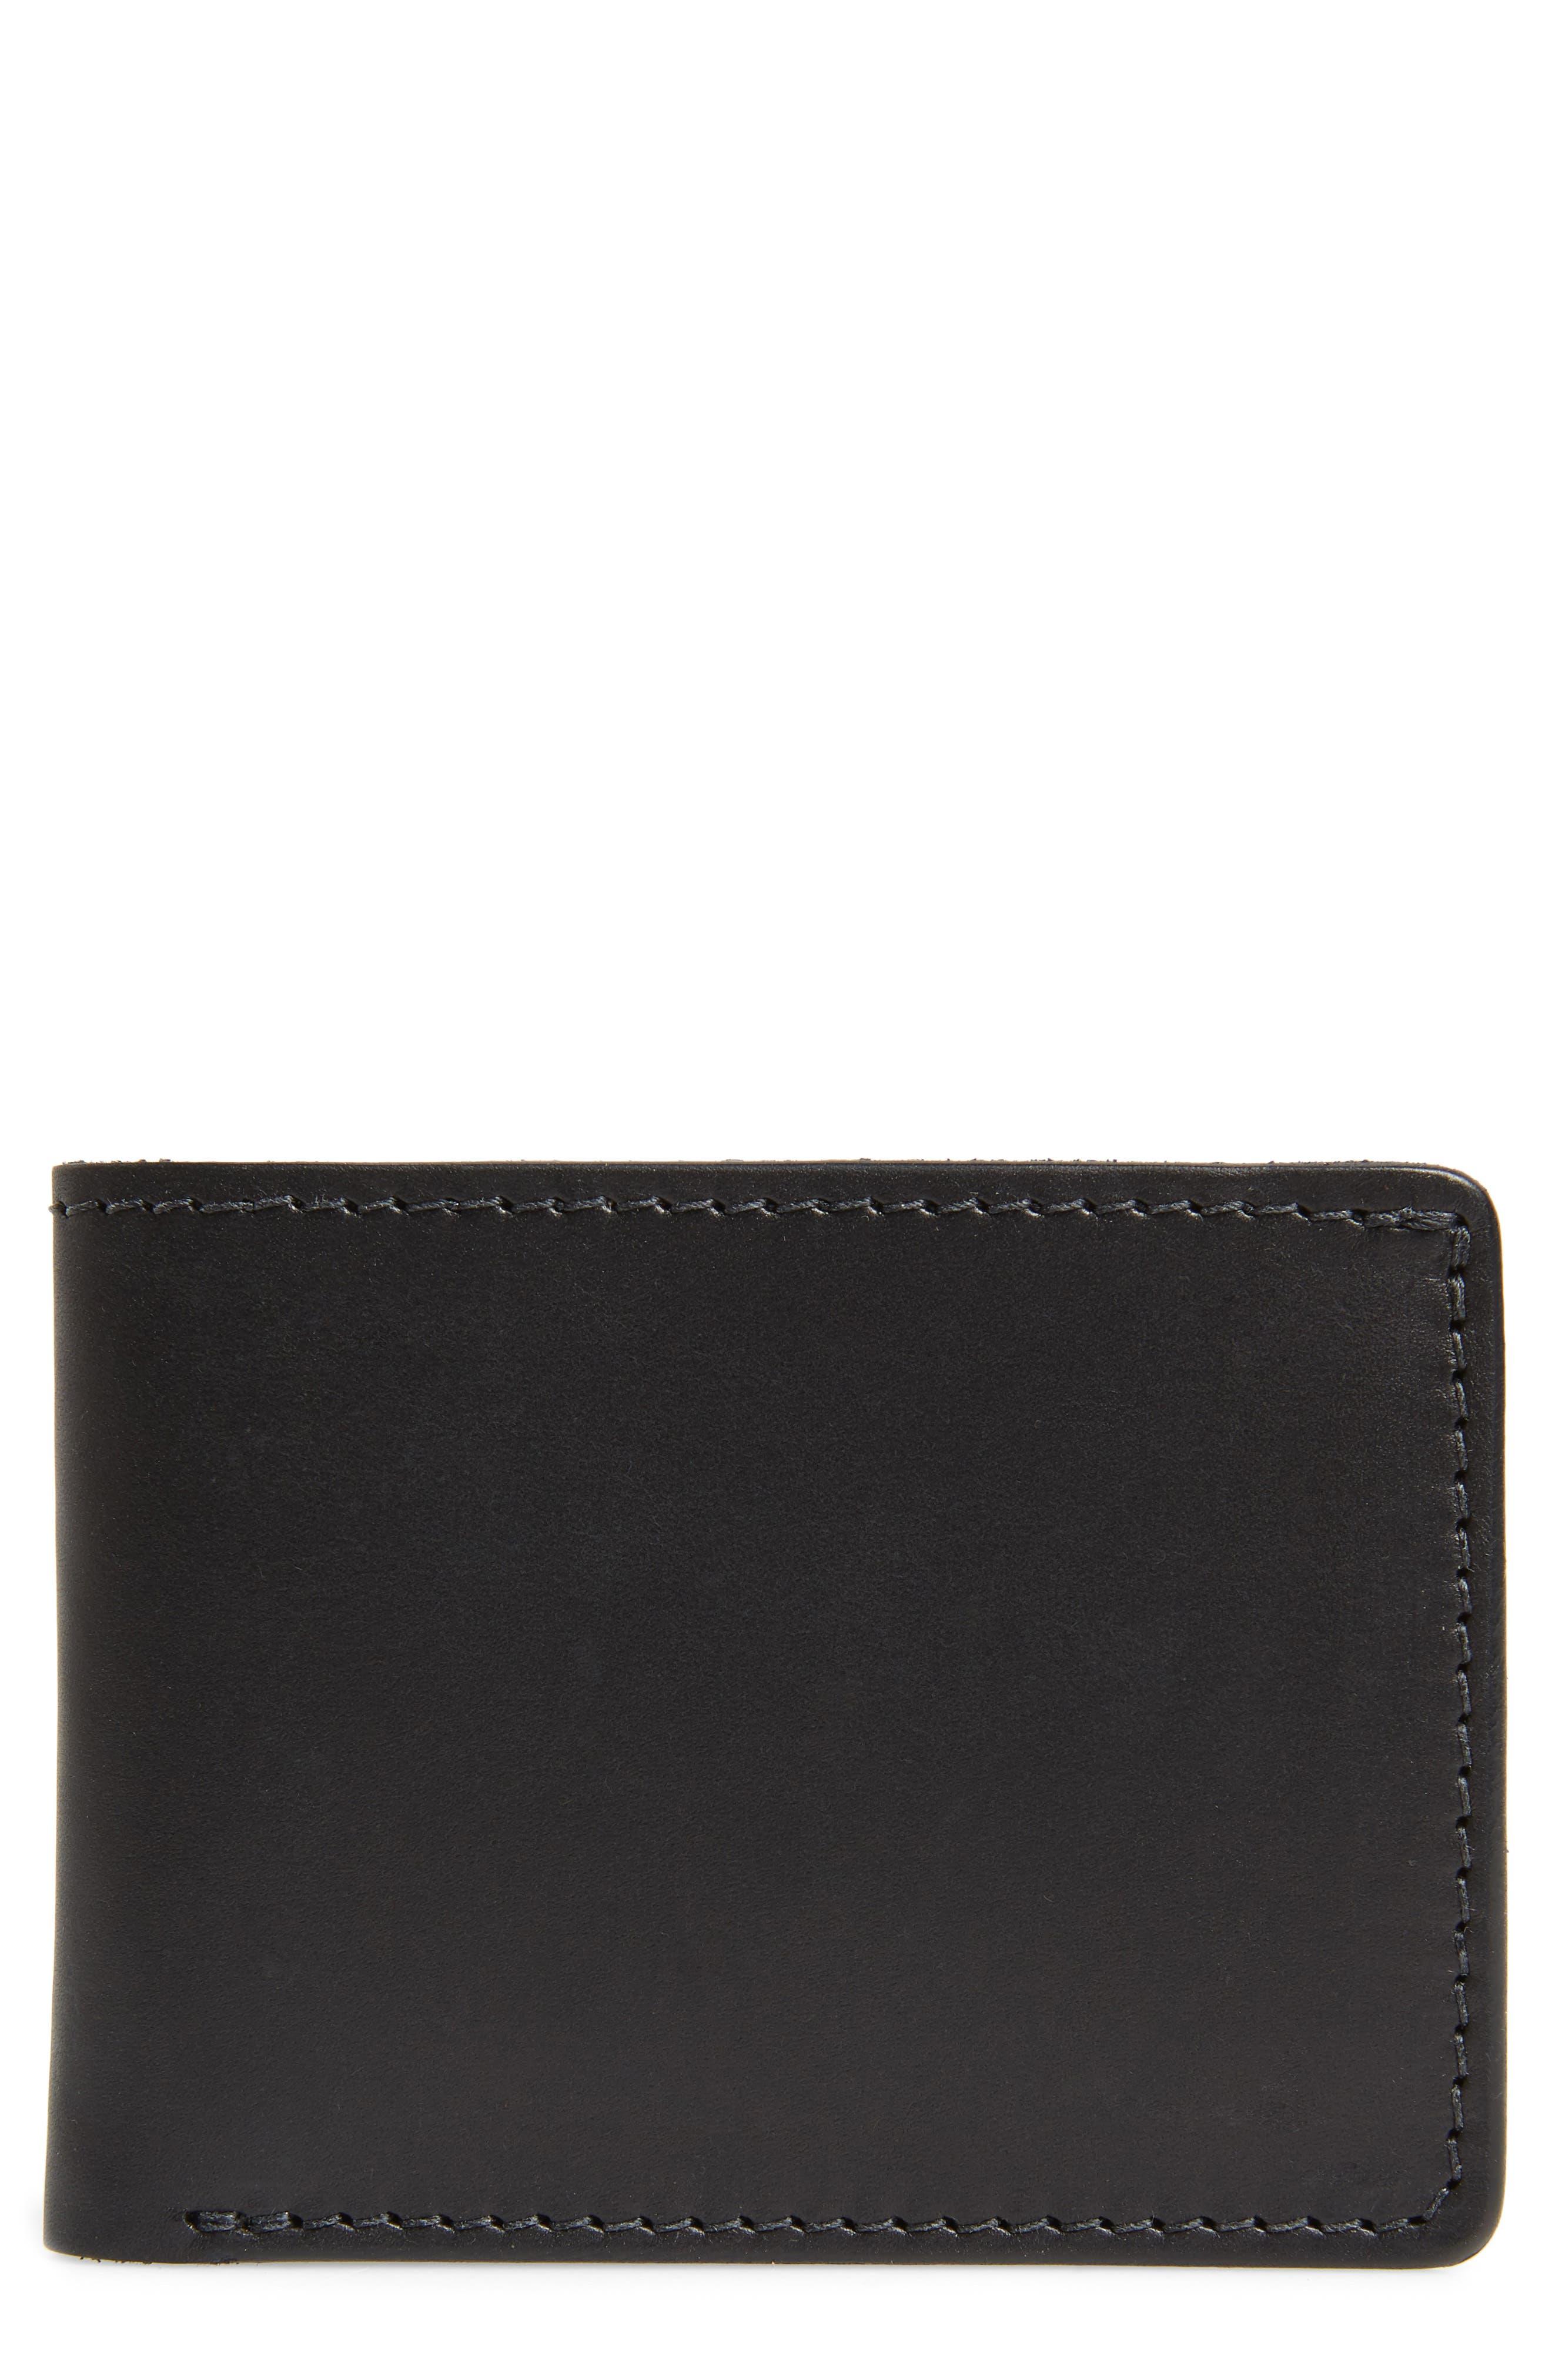 Utility Leather Bifold Wallet,                             Main thumbnail 1, color,                             Black